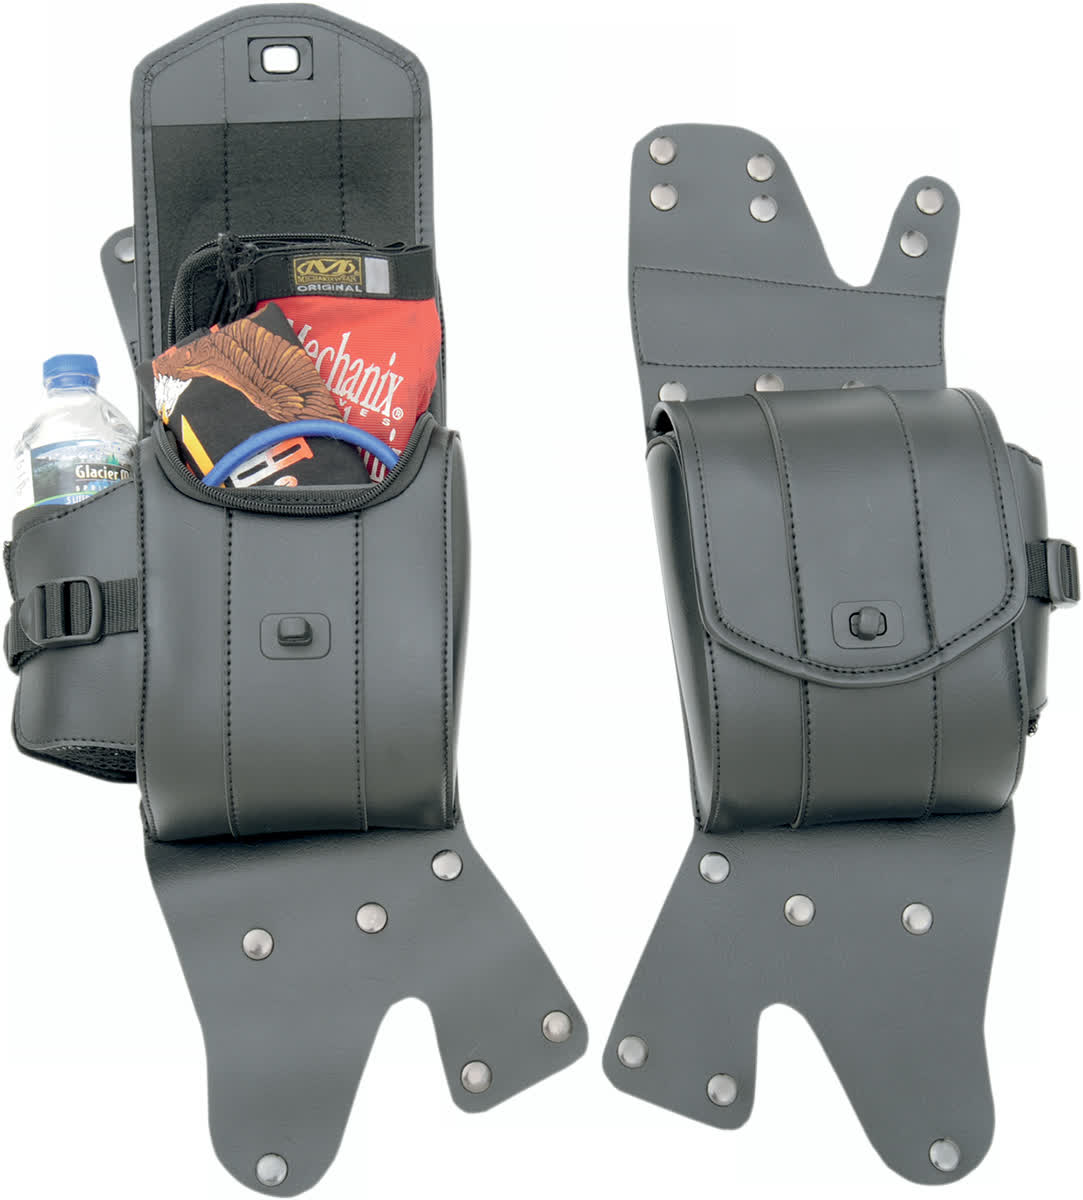 Saddlemen 3501-0715 Cruisn Deluxe Saddlebag Guard Bag Set